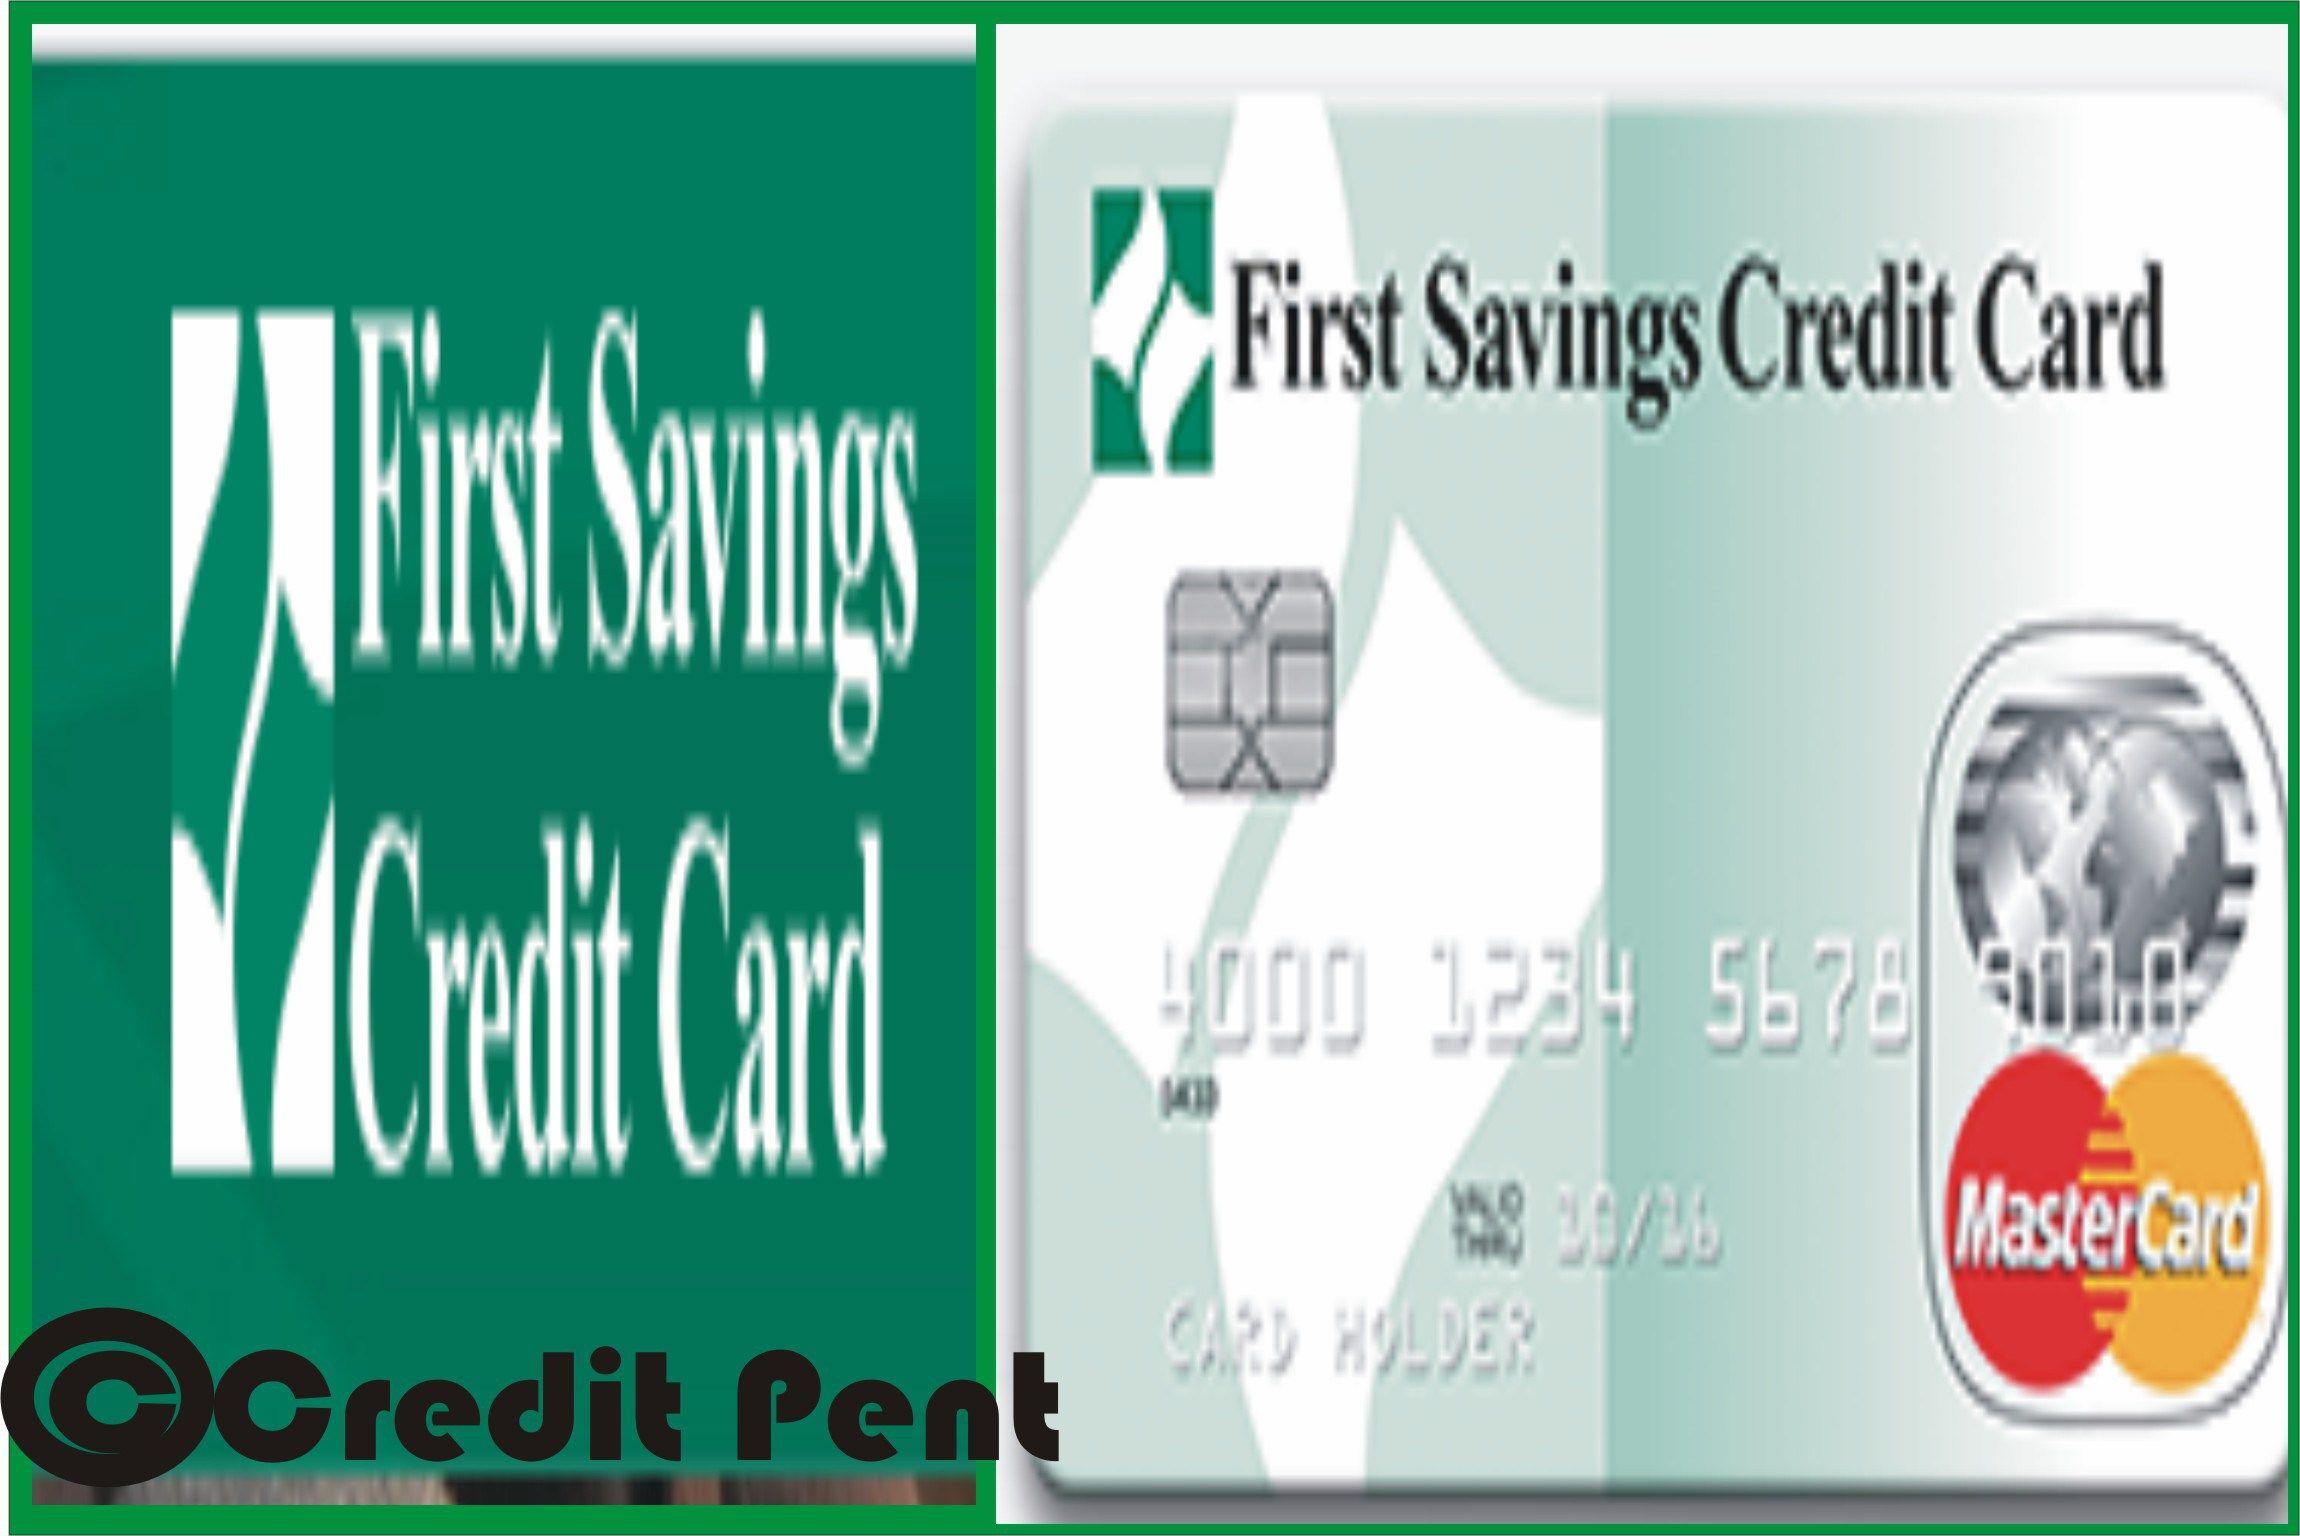 Bank credit cards, Credit